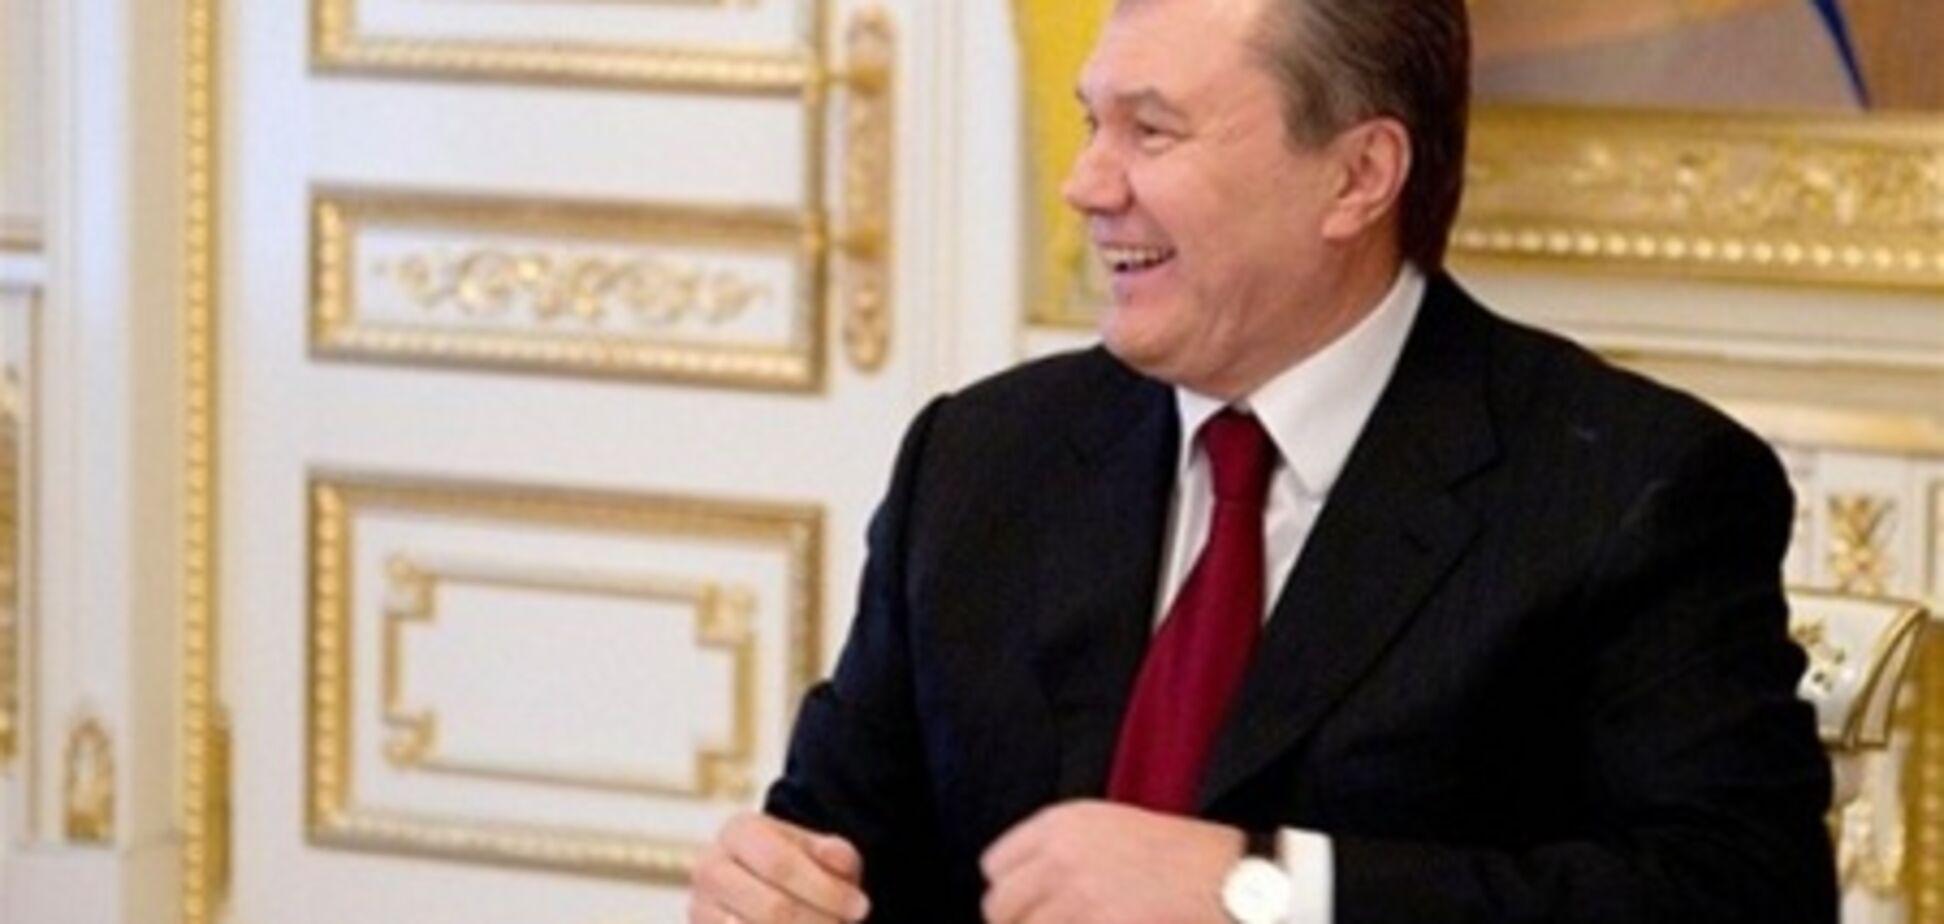 Одноклассник Януковича посвятил президенту стих. Текст